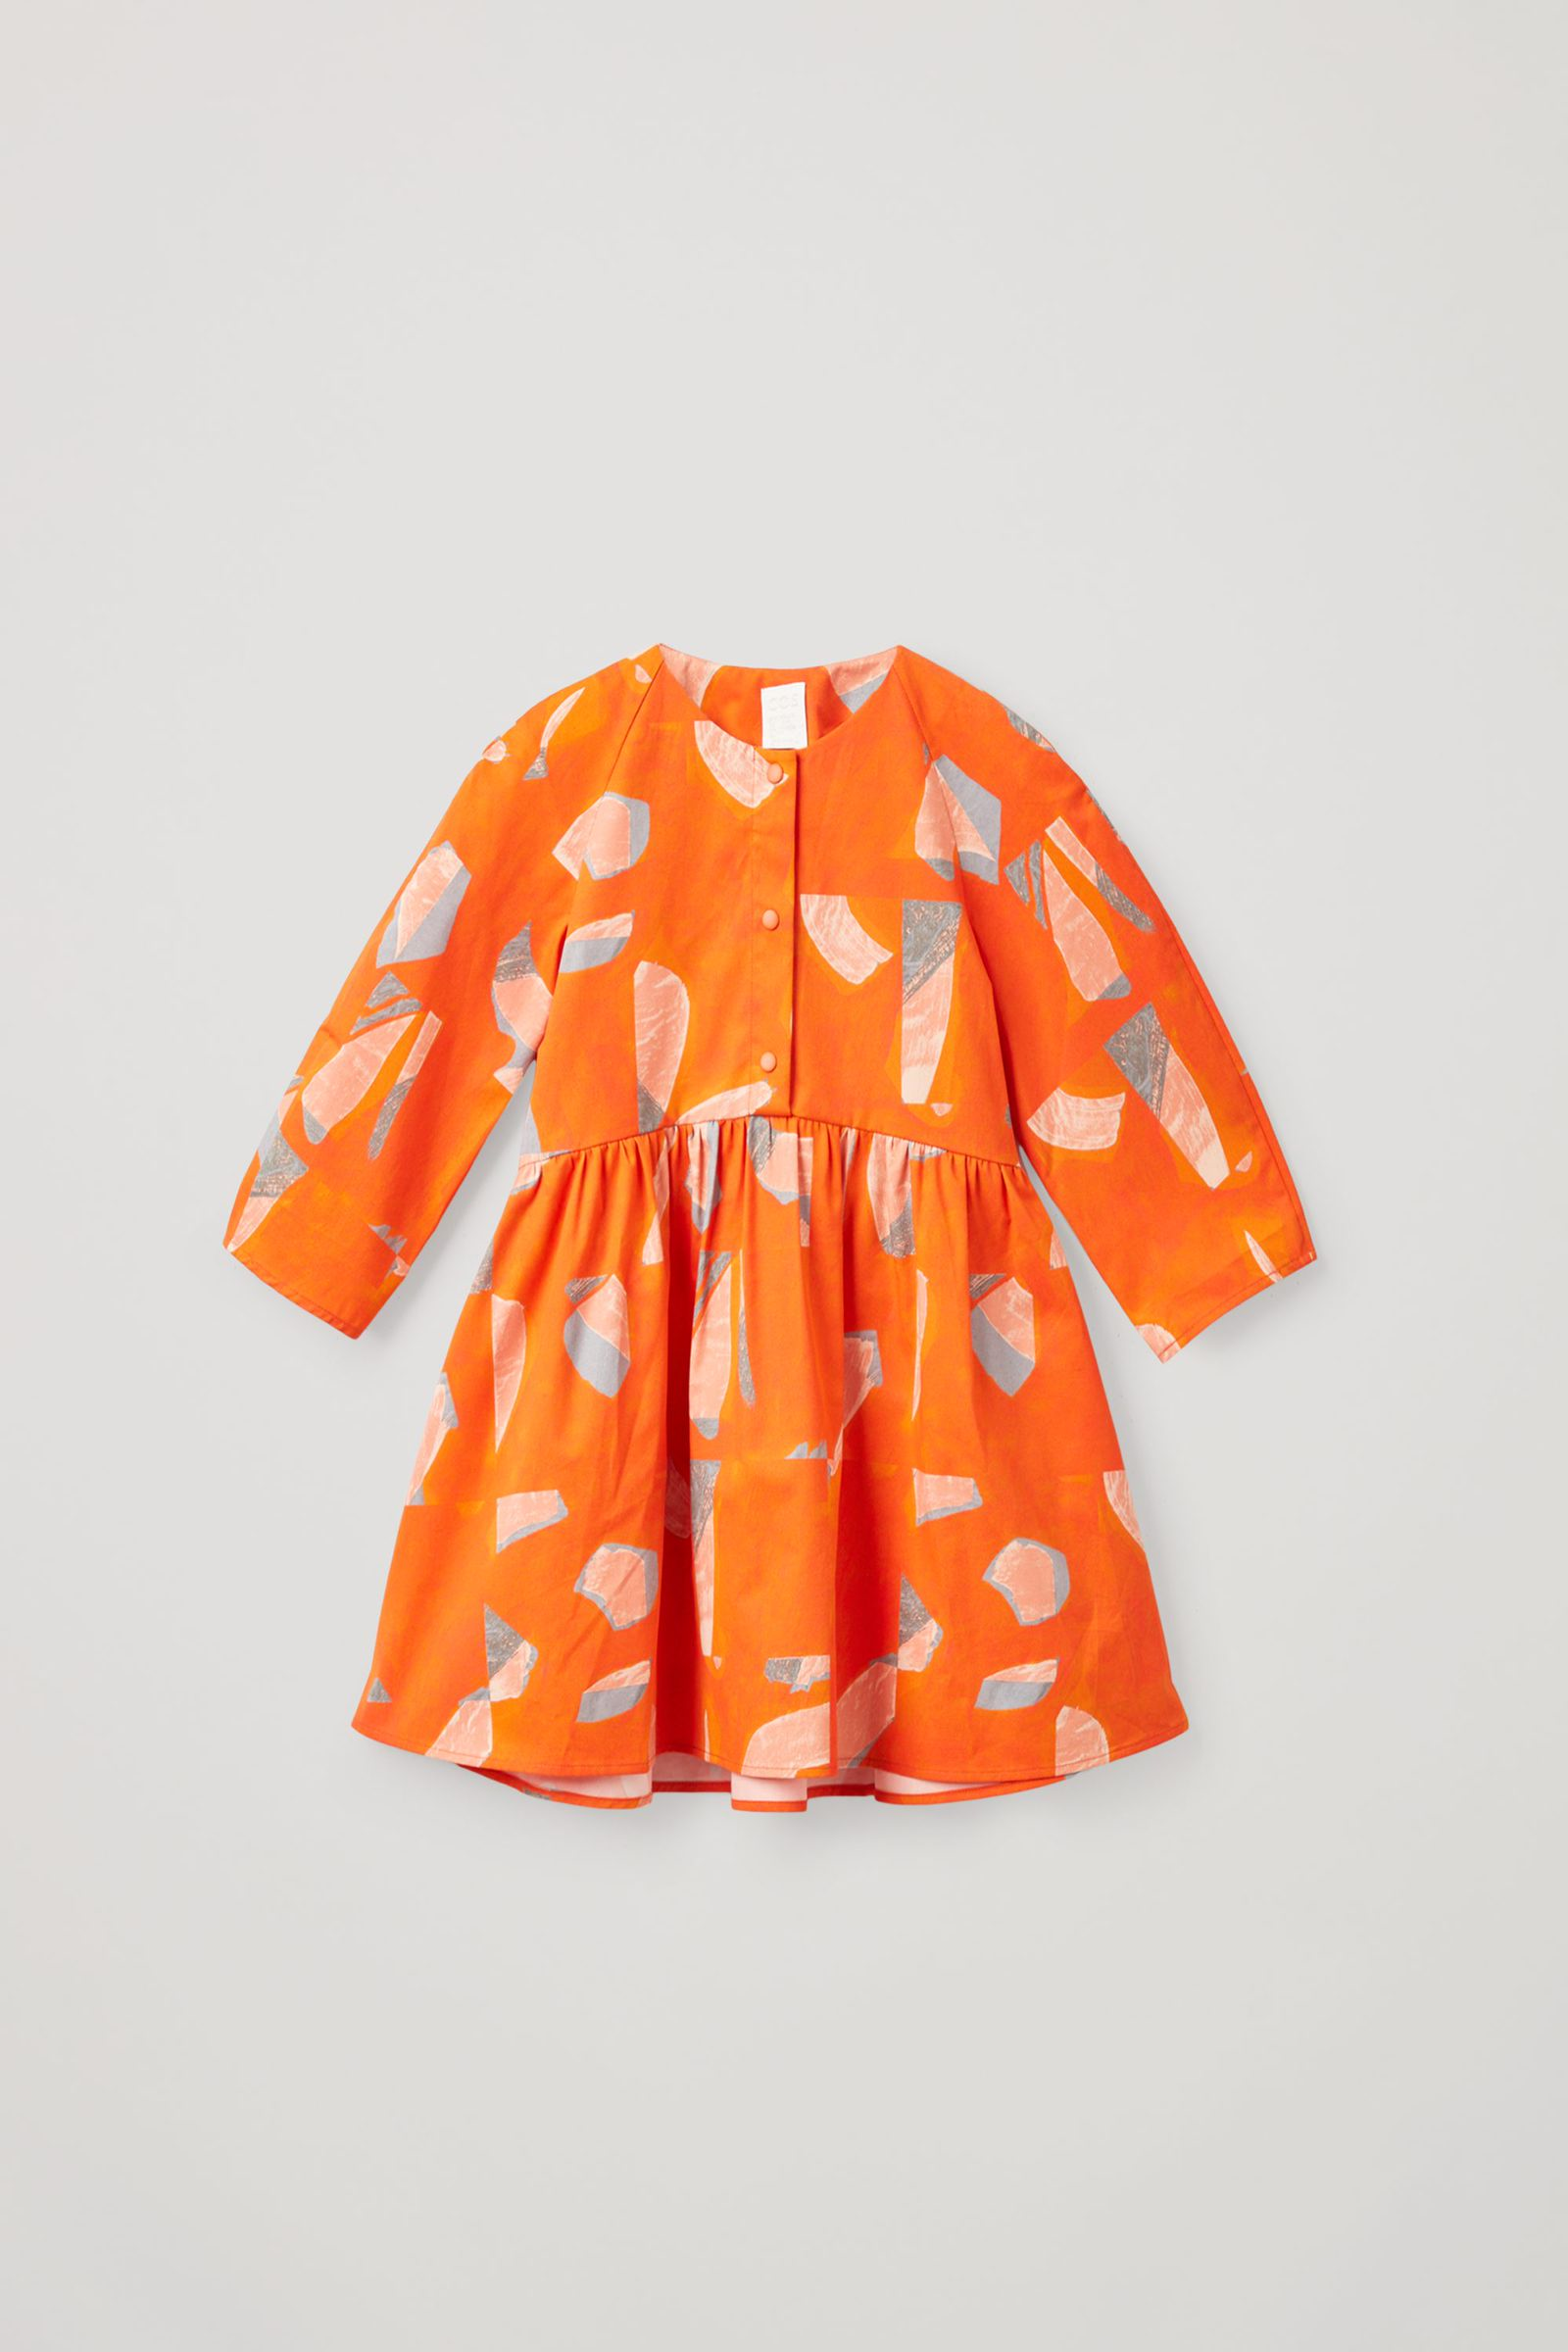 COS 프린티드 코튼 드레스의 오렌지컬러 Product입니다.